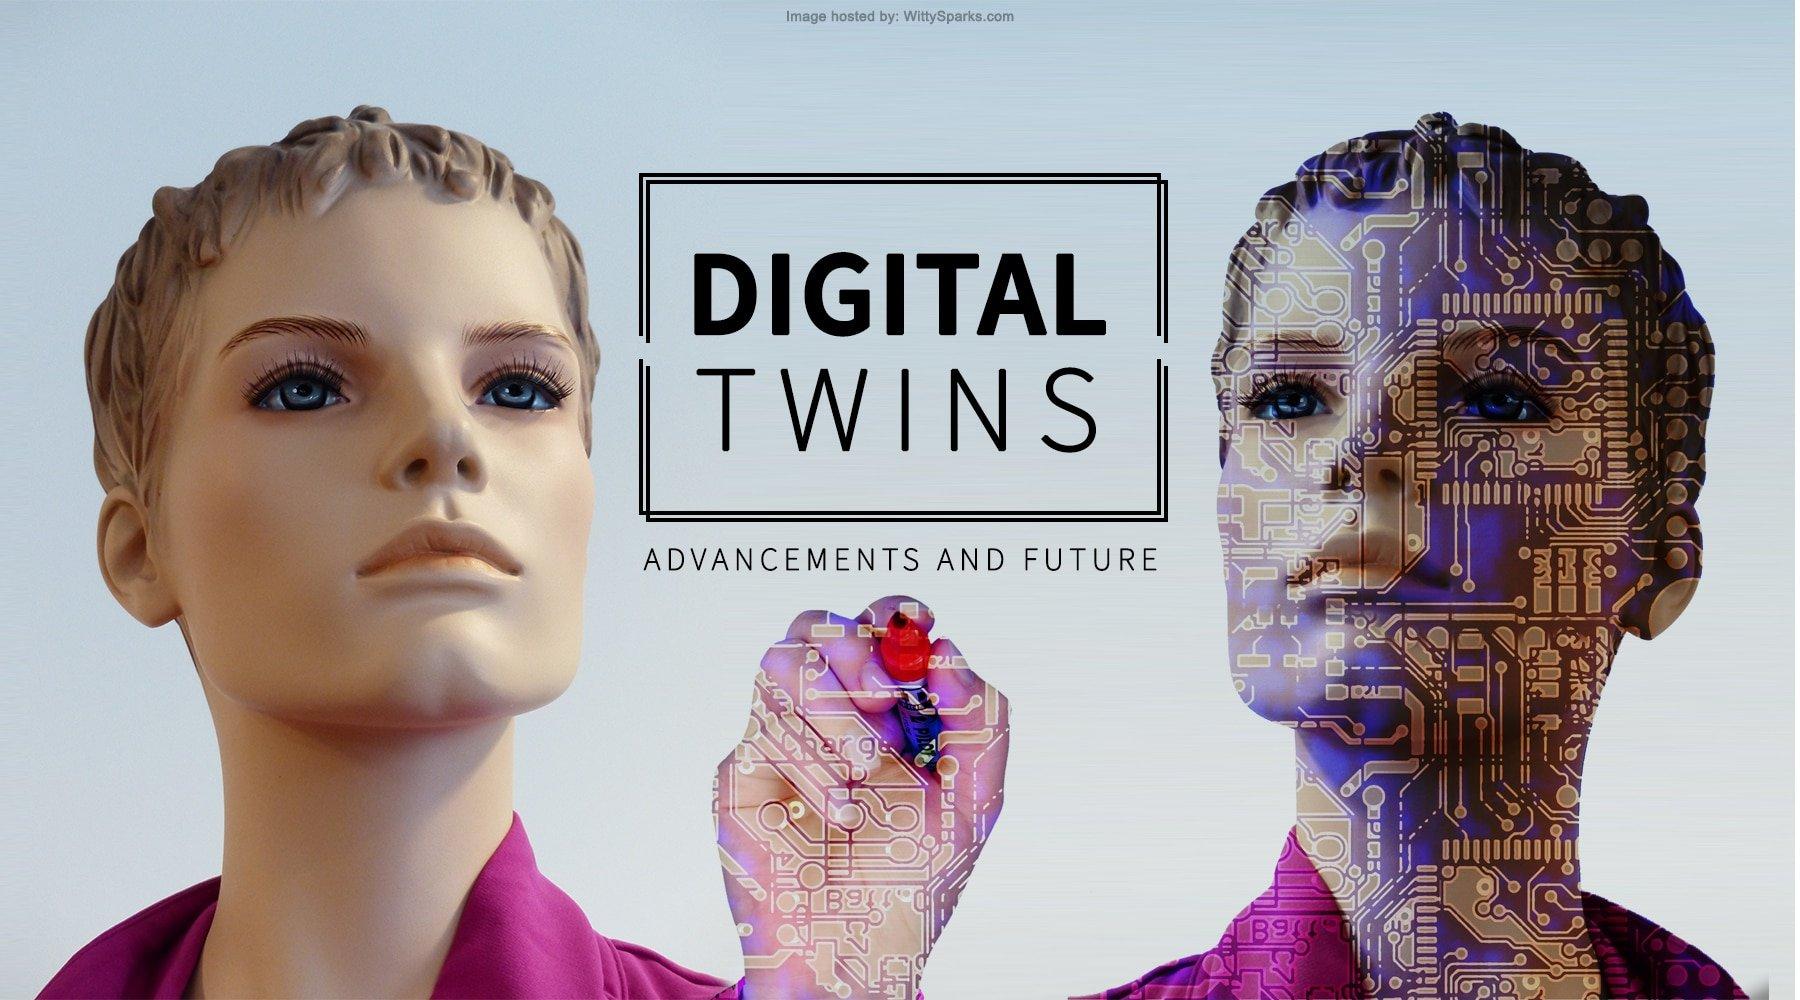 Digital Twins Advancements and Future